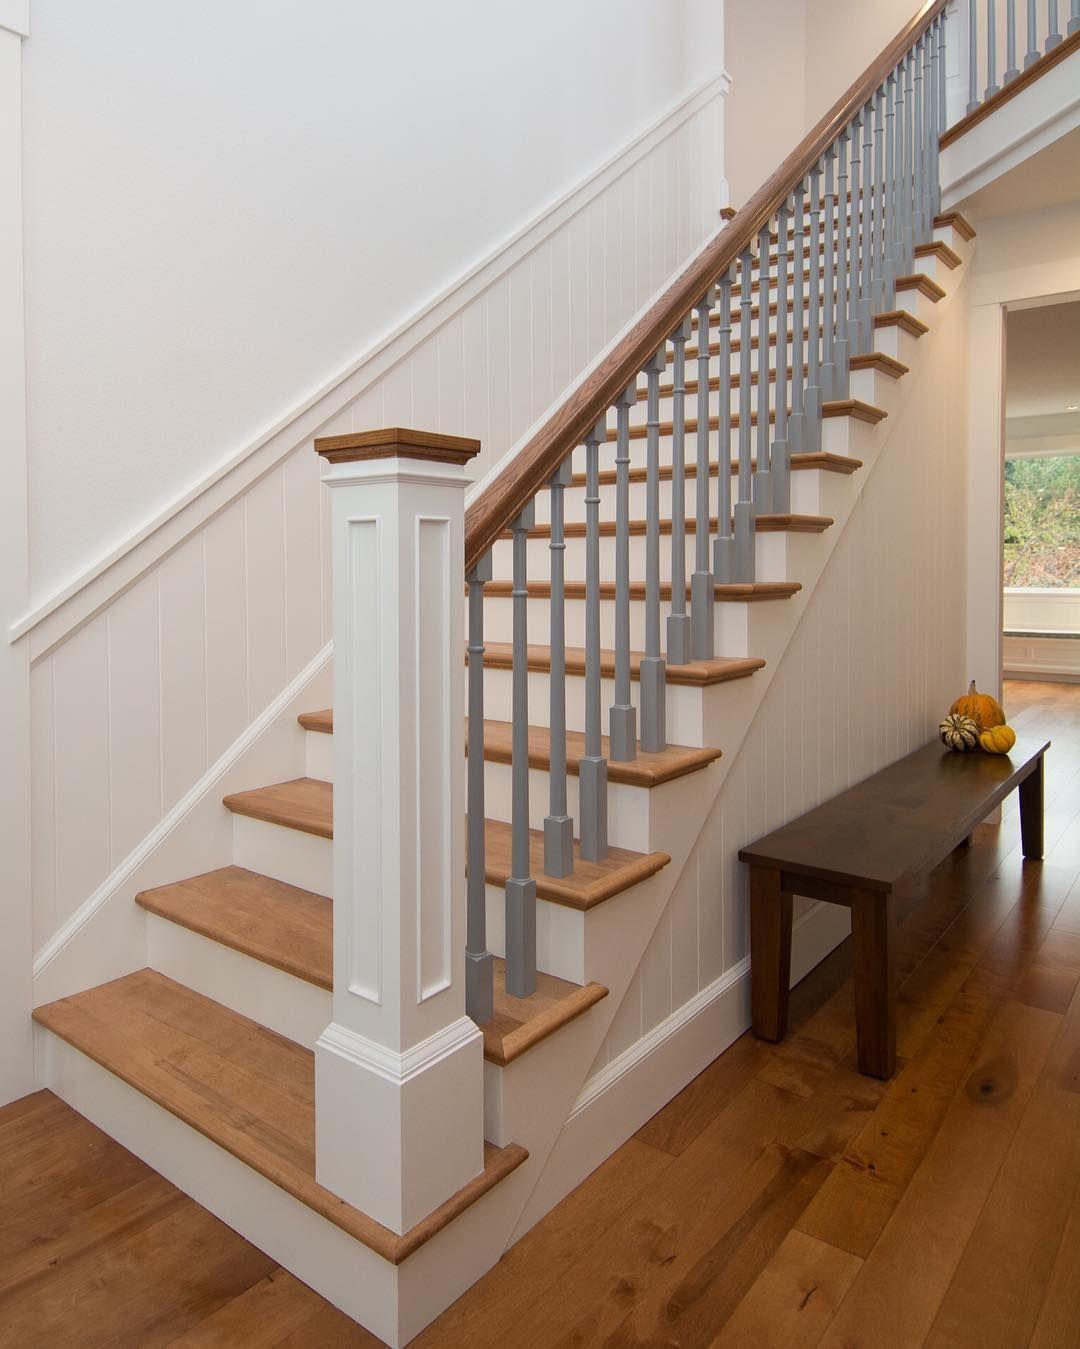 Truly One Of A Kind    Custom Built Paneled #newel With Oak Cap And # Handrail Plus #custom Made #birch #treads To Match #prefinished  #hardwoodfloors Along ...